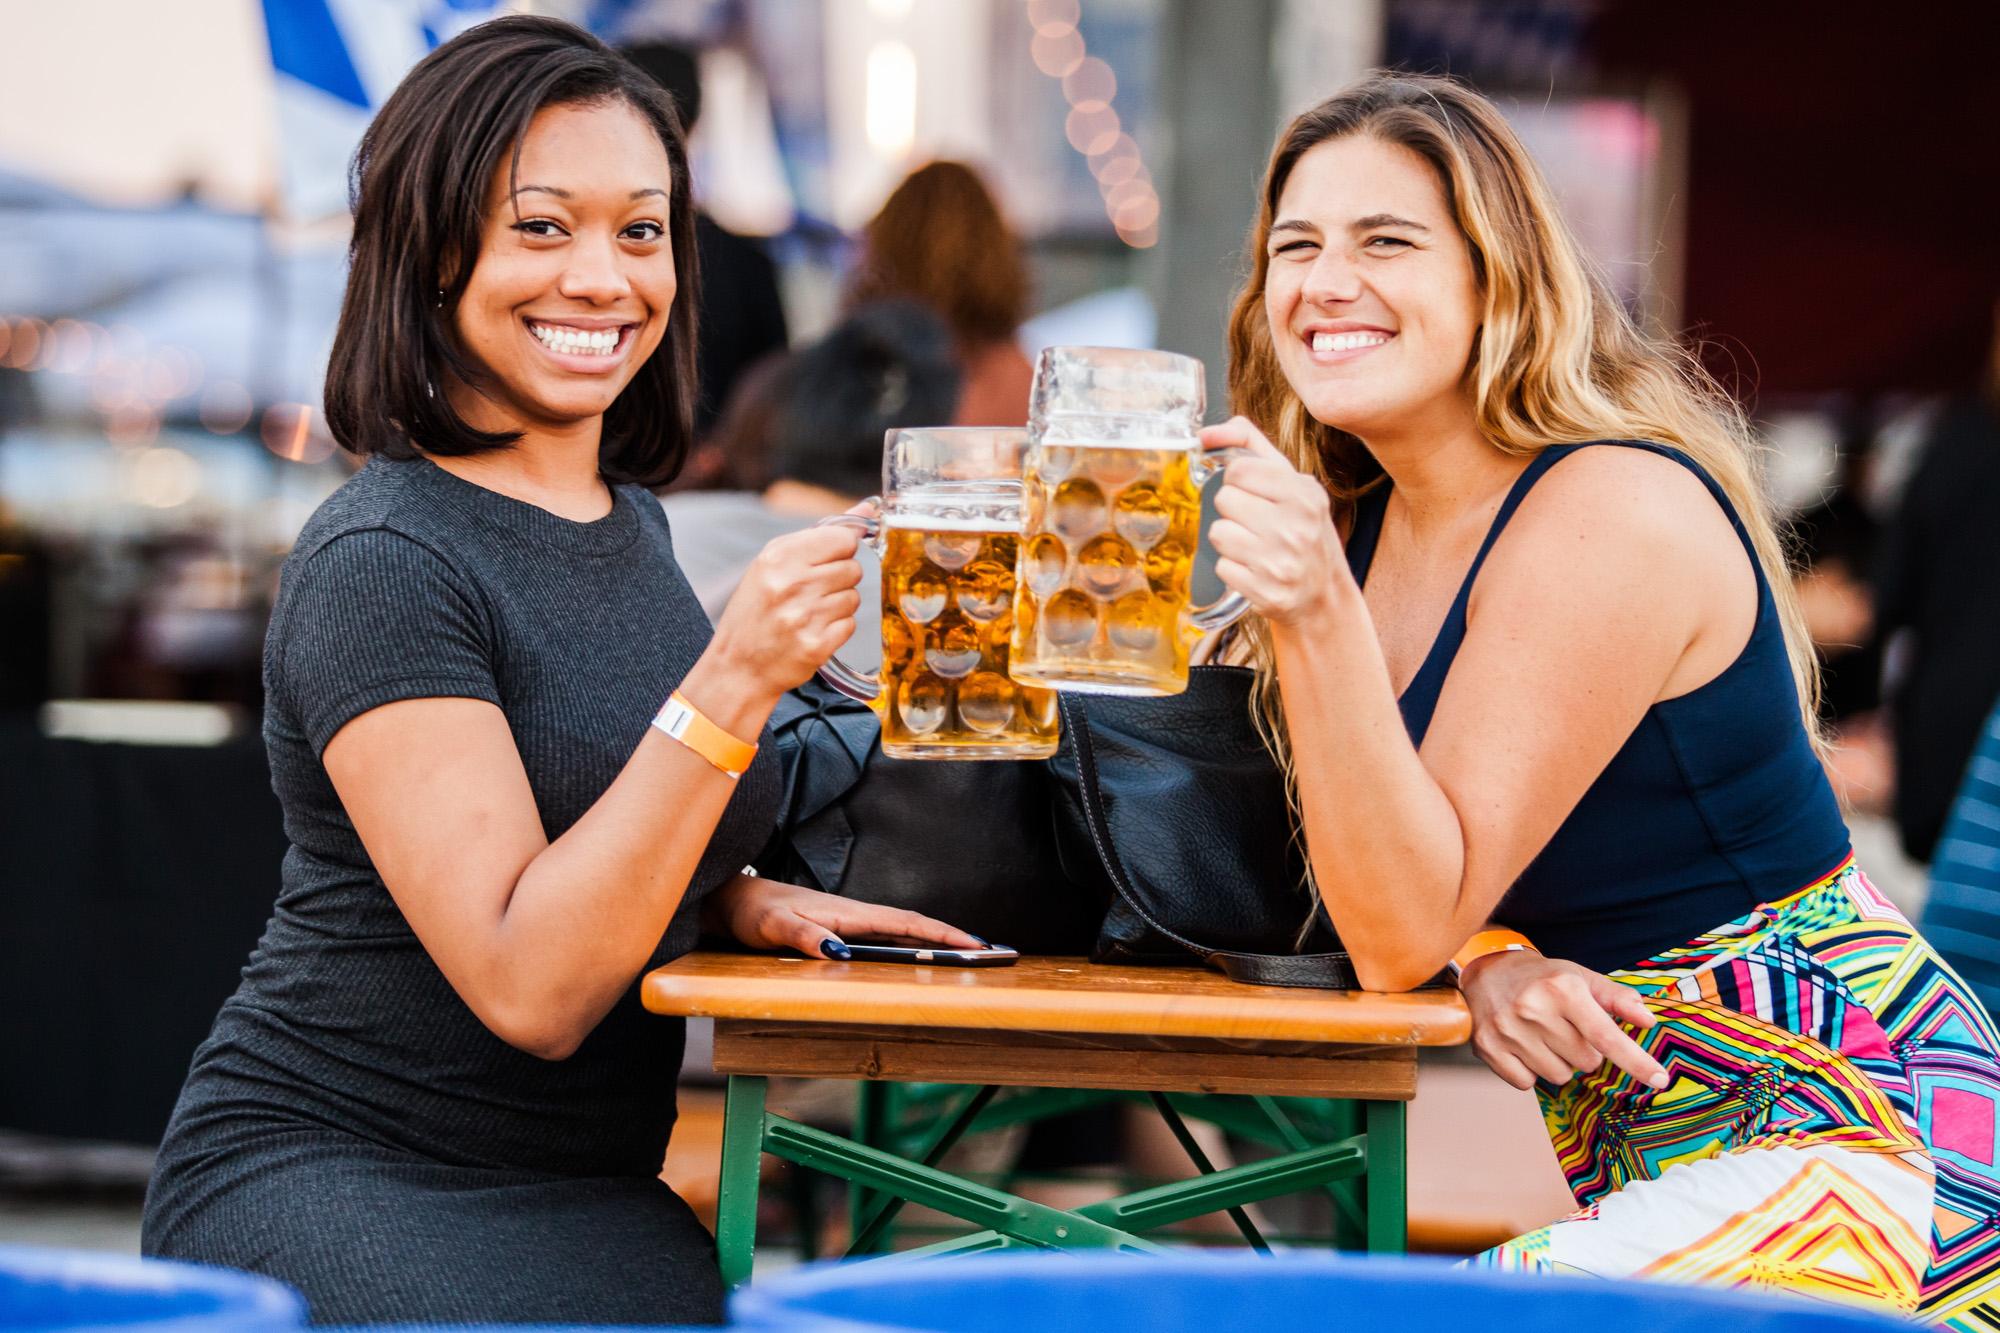 OktoberFest NYC at Watermark 2015 - Beer Toast